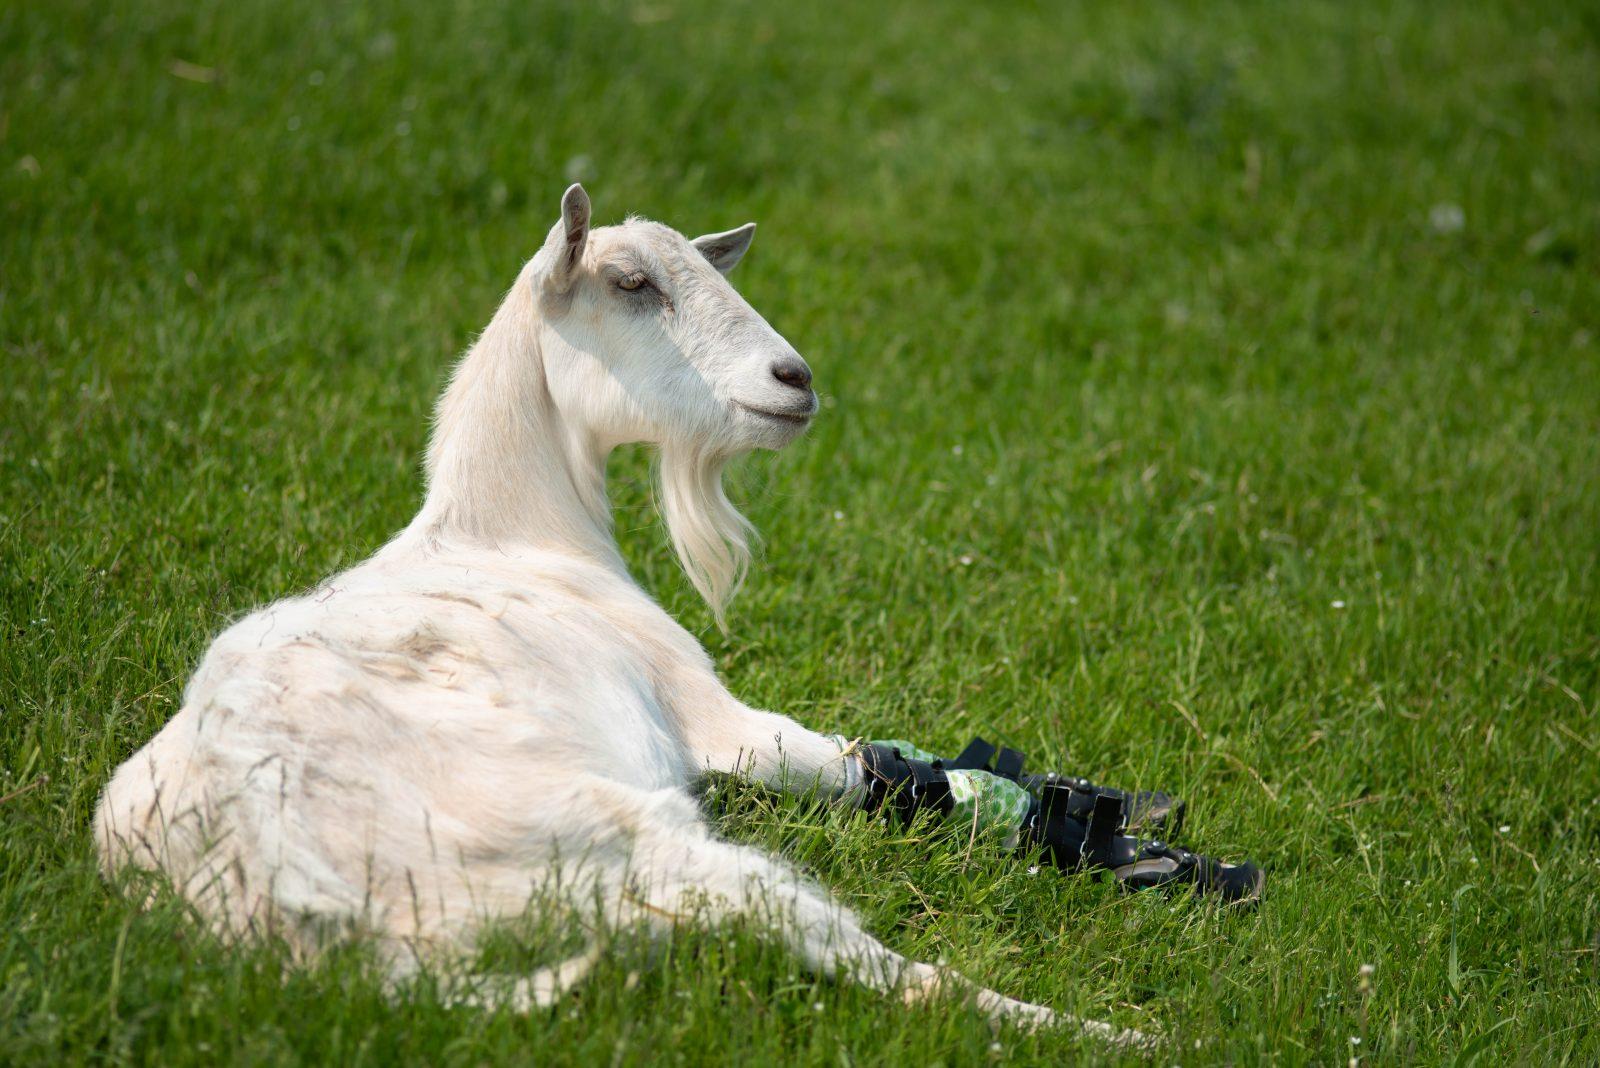 Bam Bam Goat at Farm Sanctuary